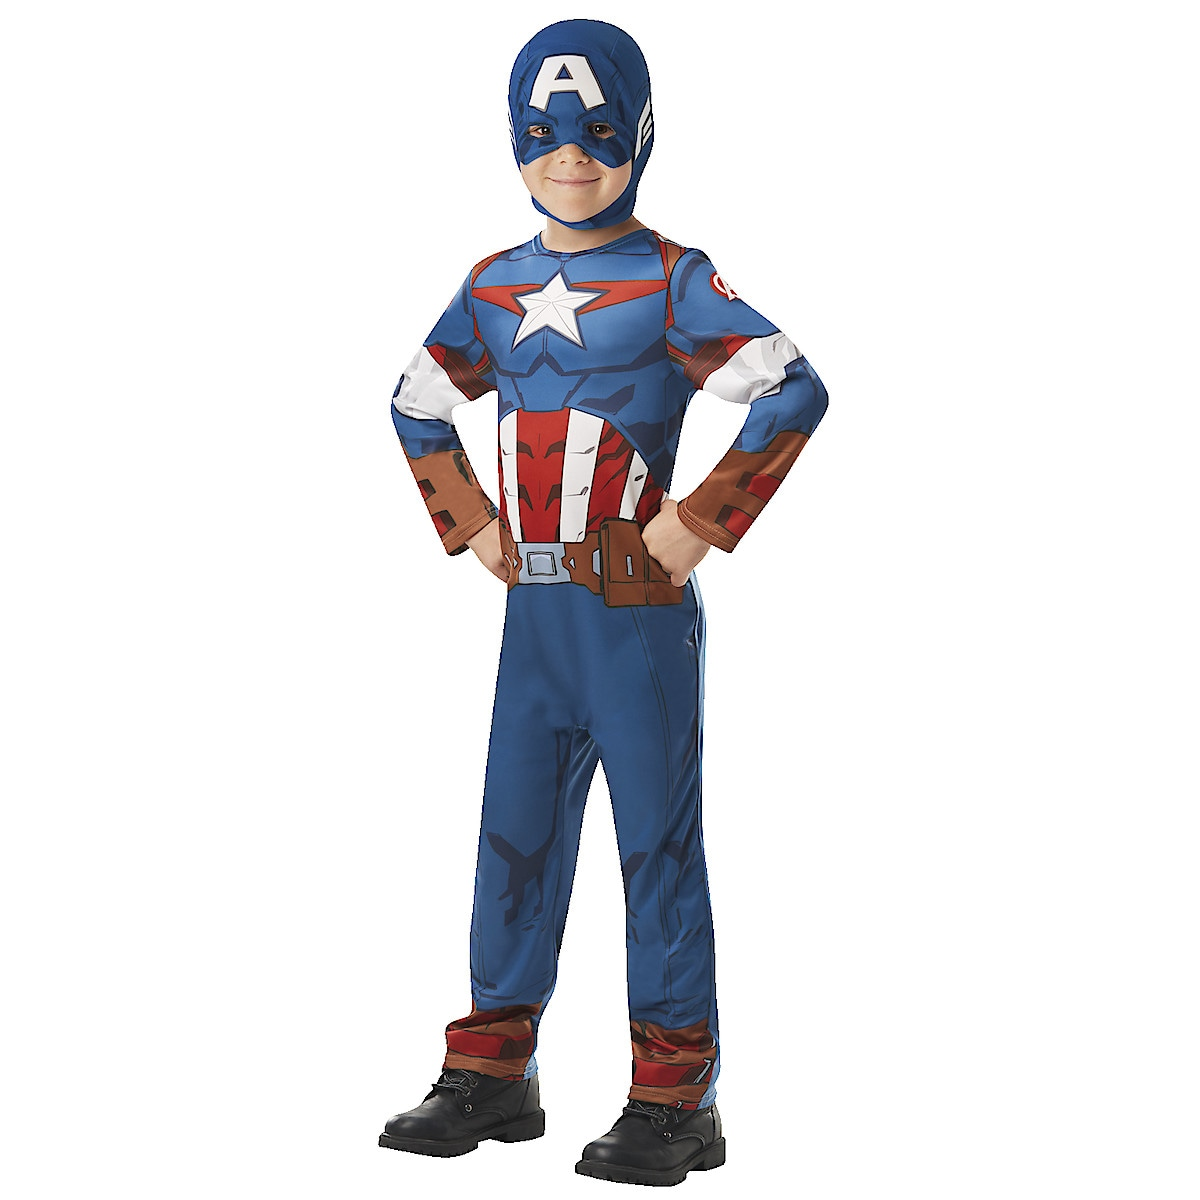 Kinderkostüm Avengers Captain America